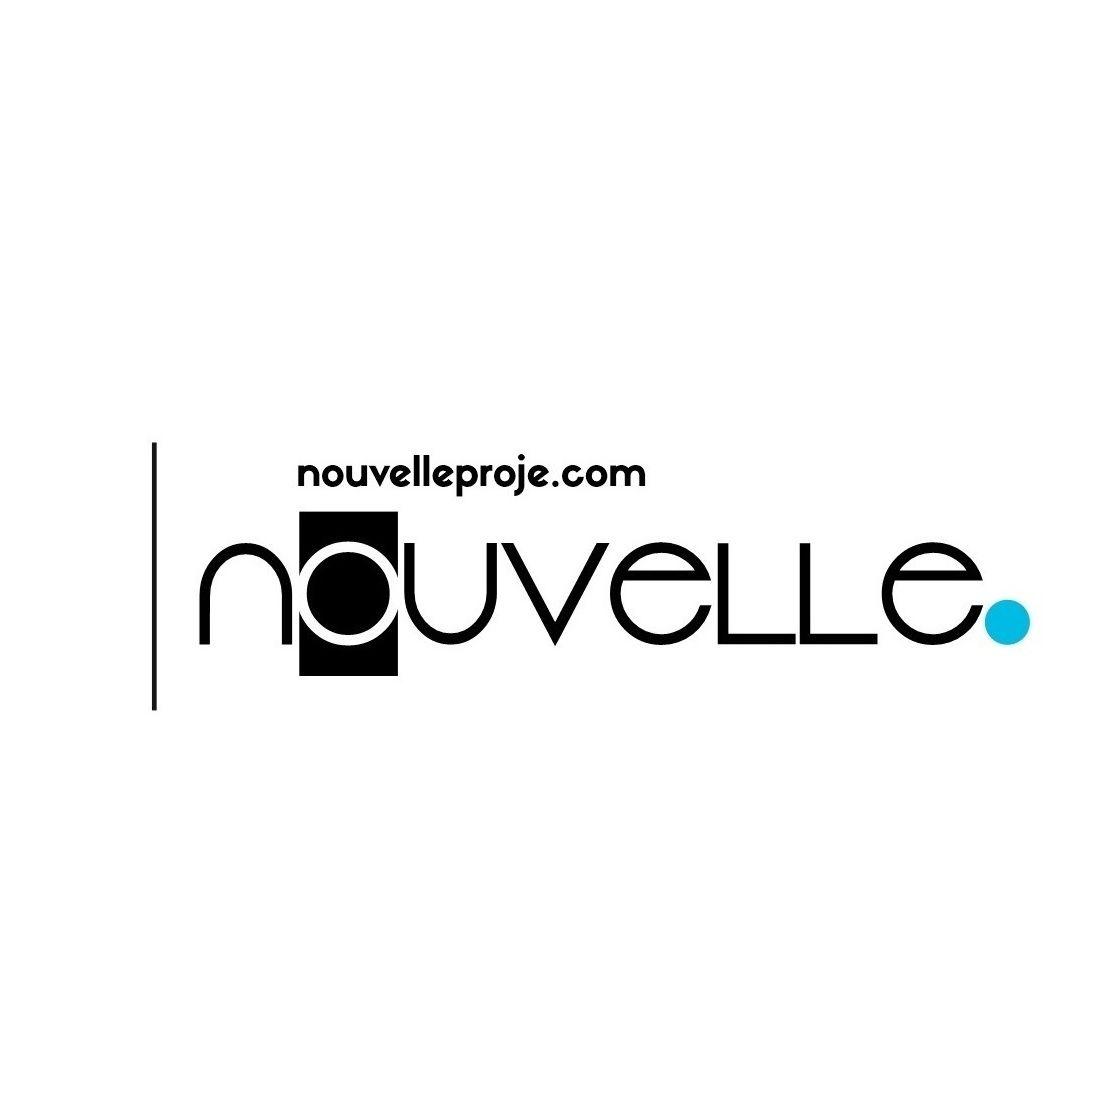 NOUVELLE. | Proje Danışmanlık